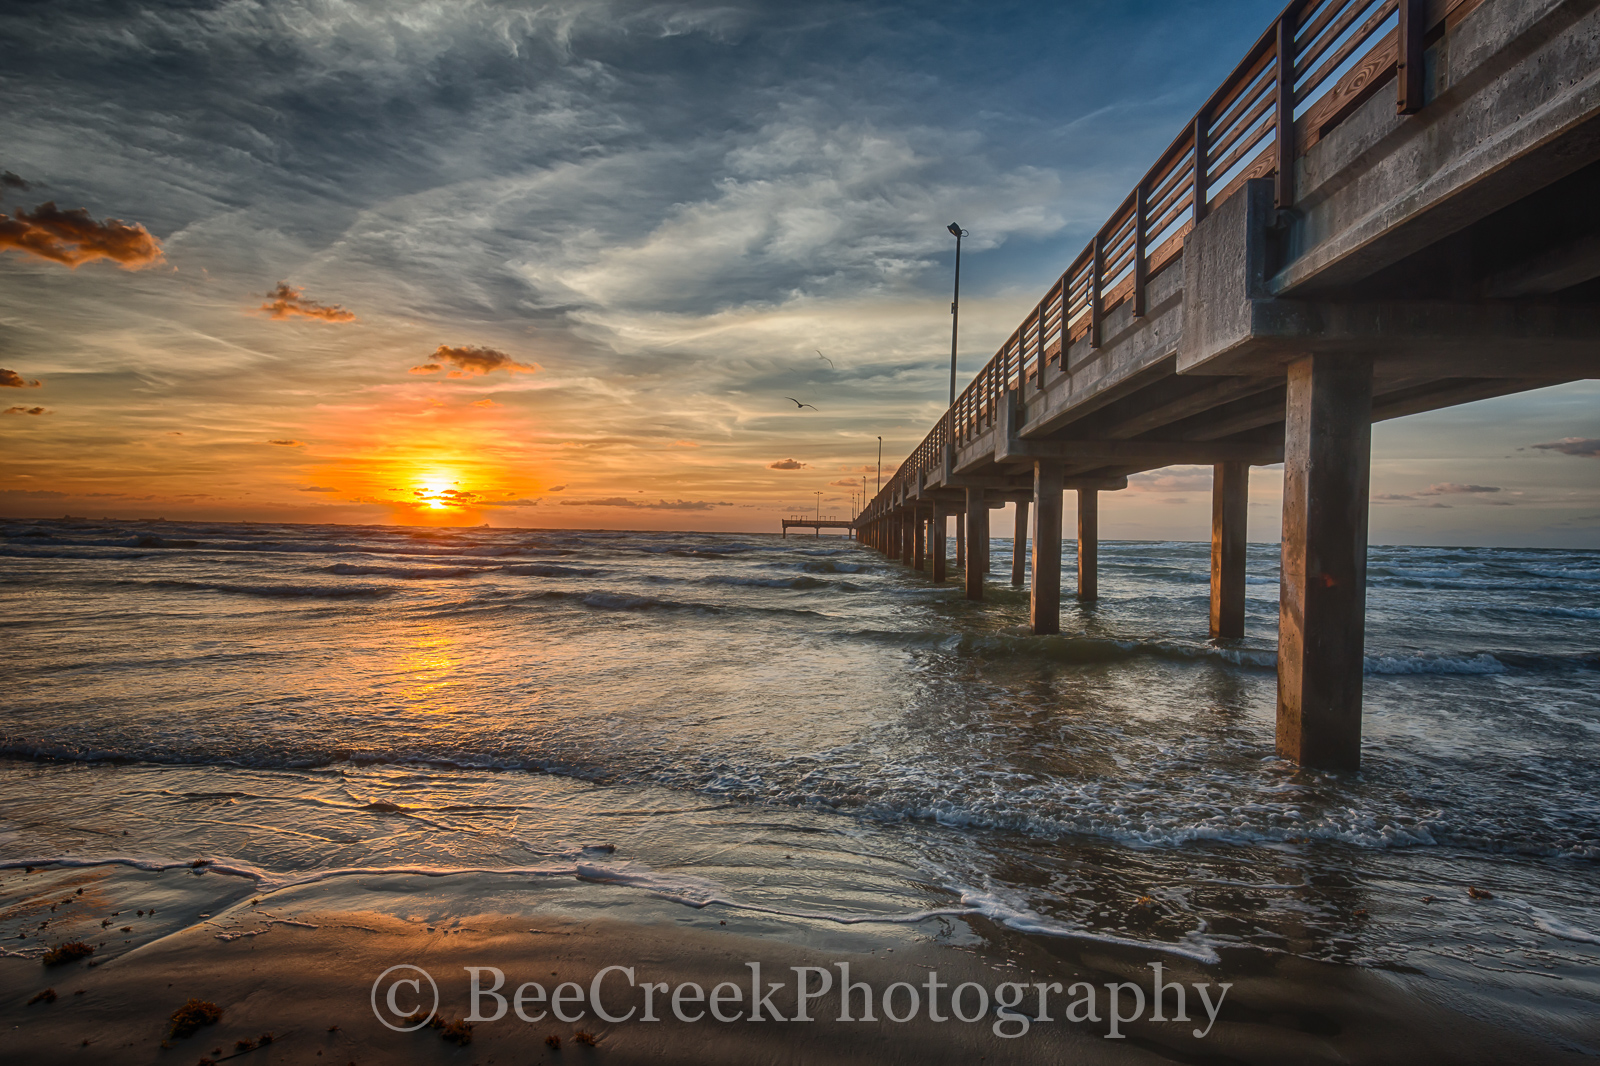 Caldwell pier, Texas piers, texas pier, Port A, Port Aransas, Sunrise, Texas Coast, Texas beach, beach, coast, fishing pier, gulf of mexico, landscape, nature, ocean, sand, sea weed, seascape, surf, t, photo